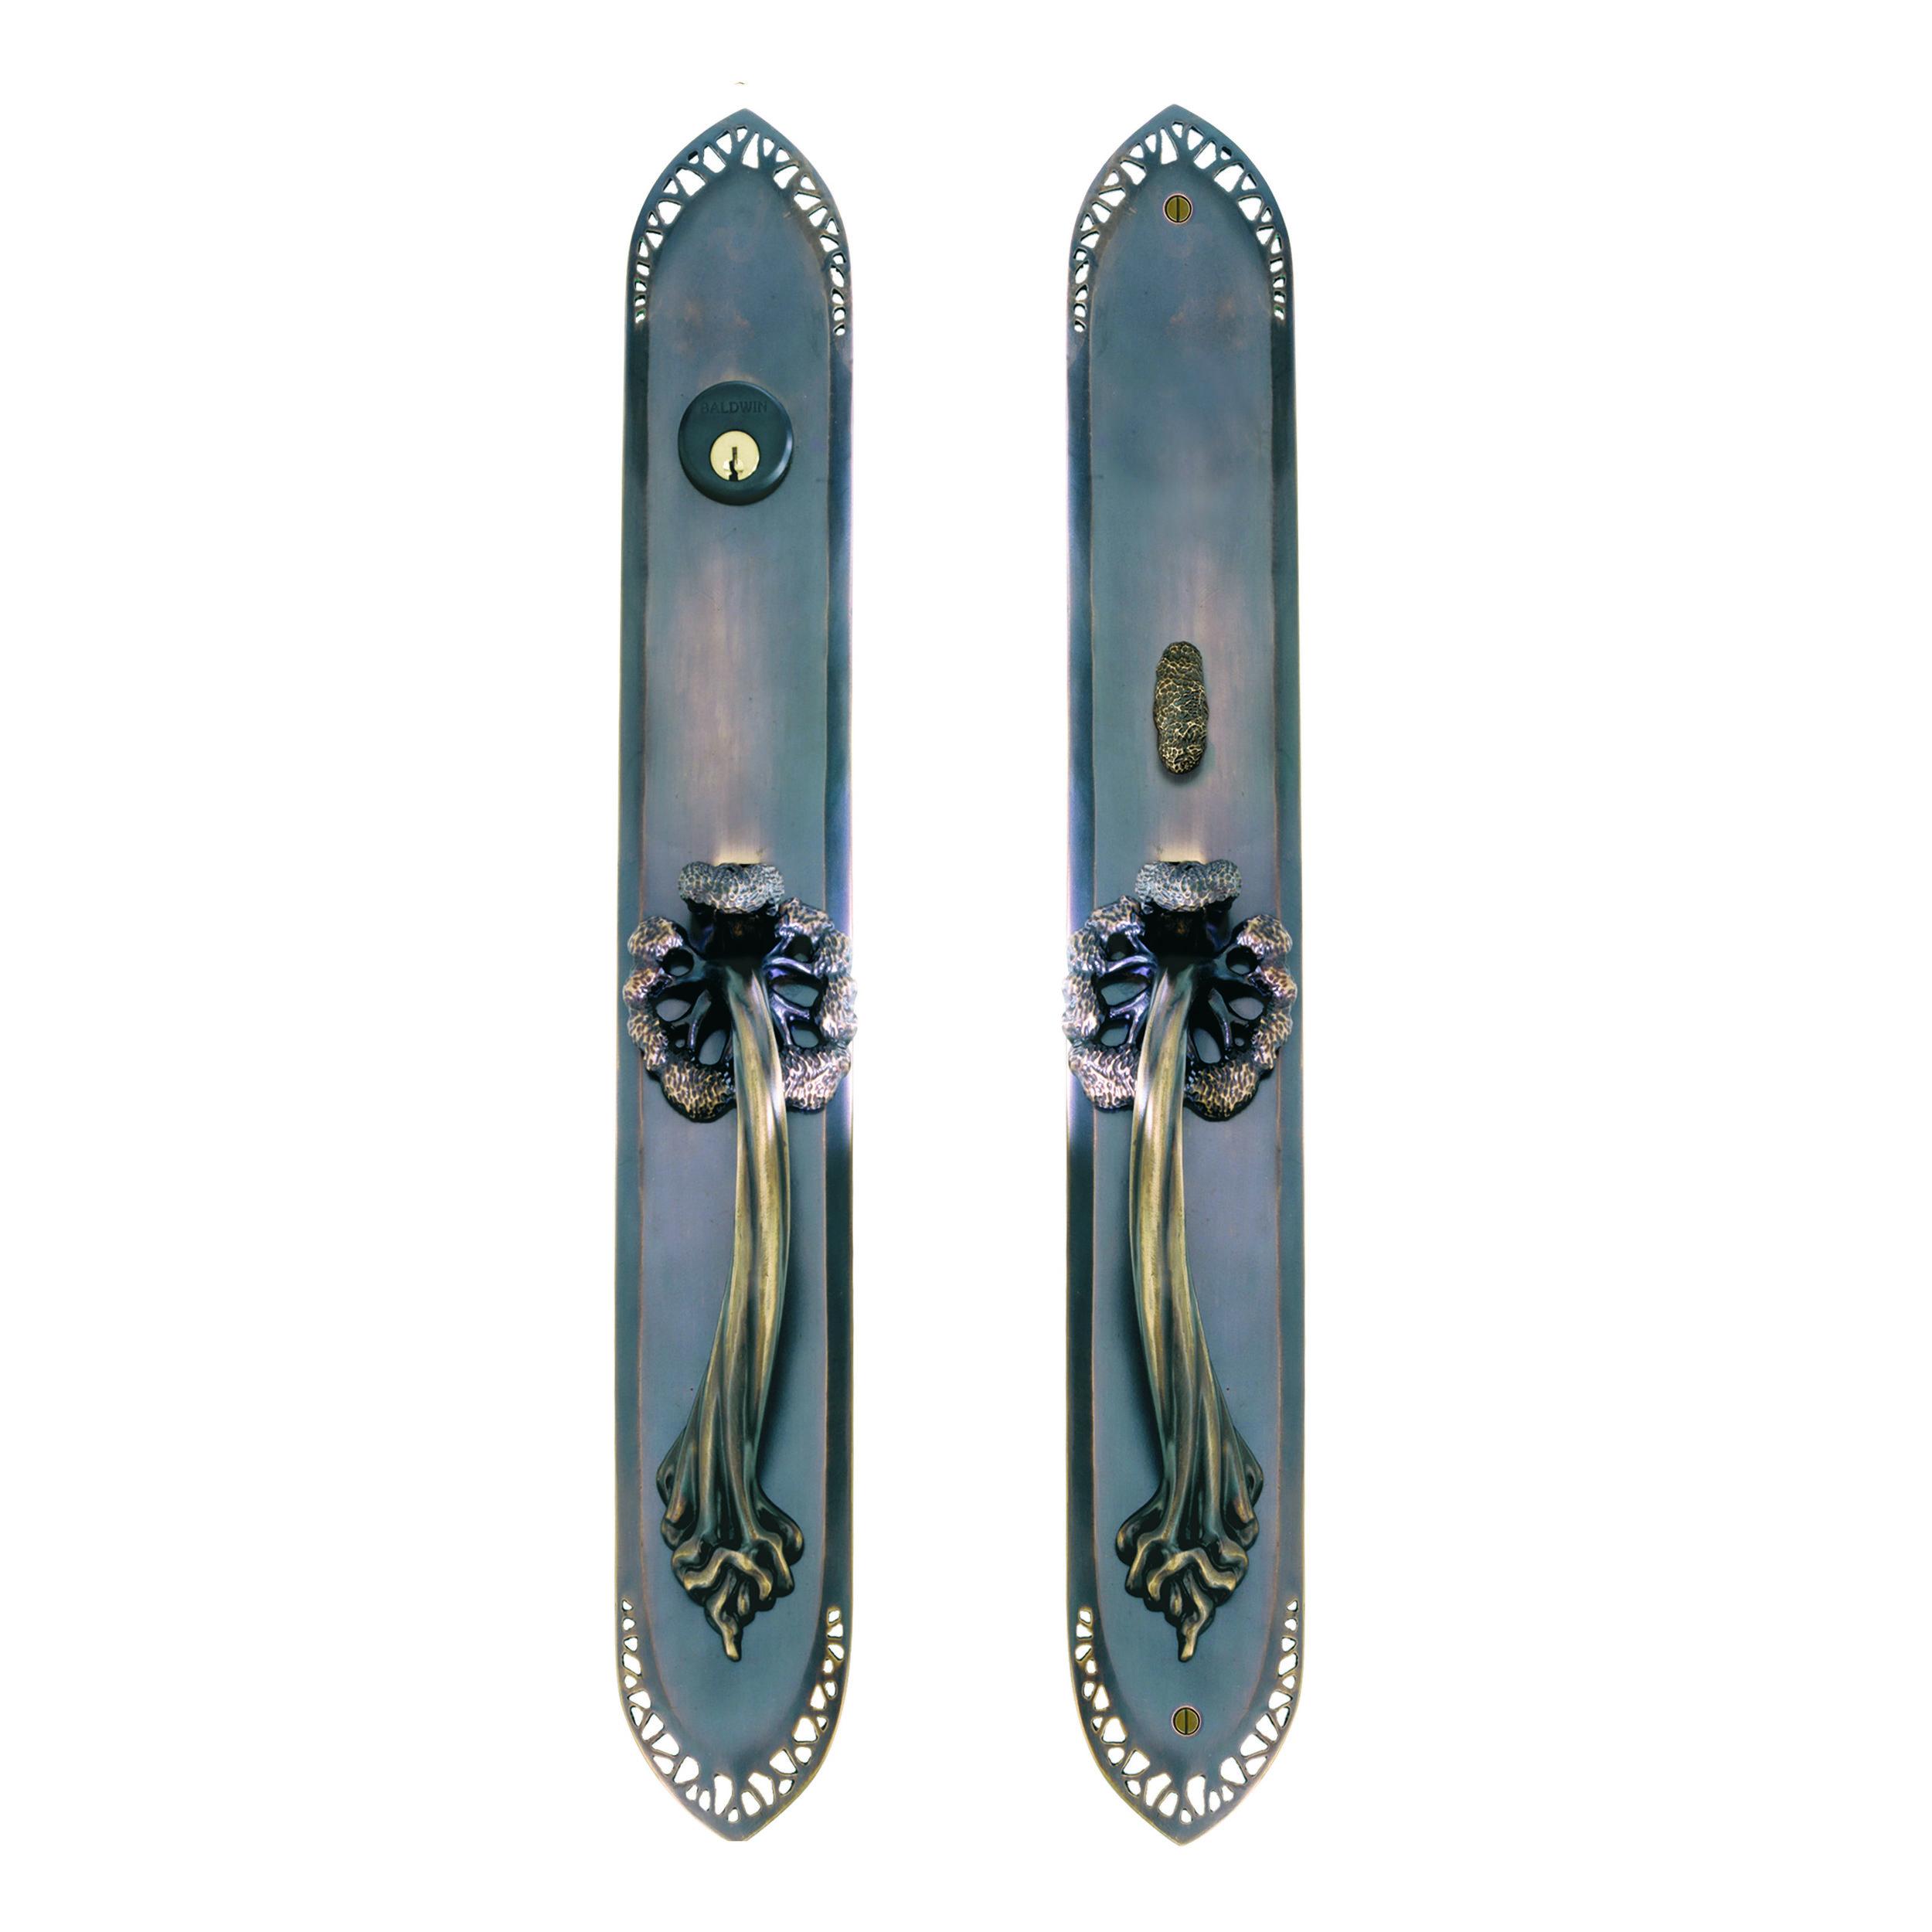 entry-door-handle-thumb-latch-hedgerow.jpg